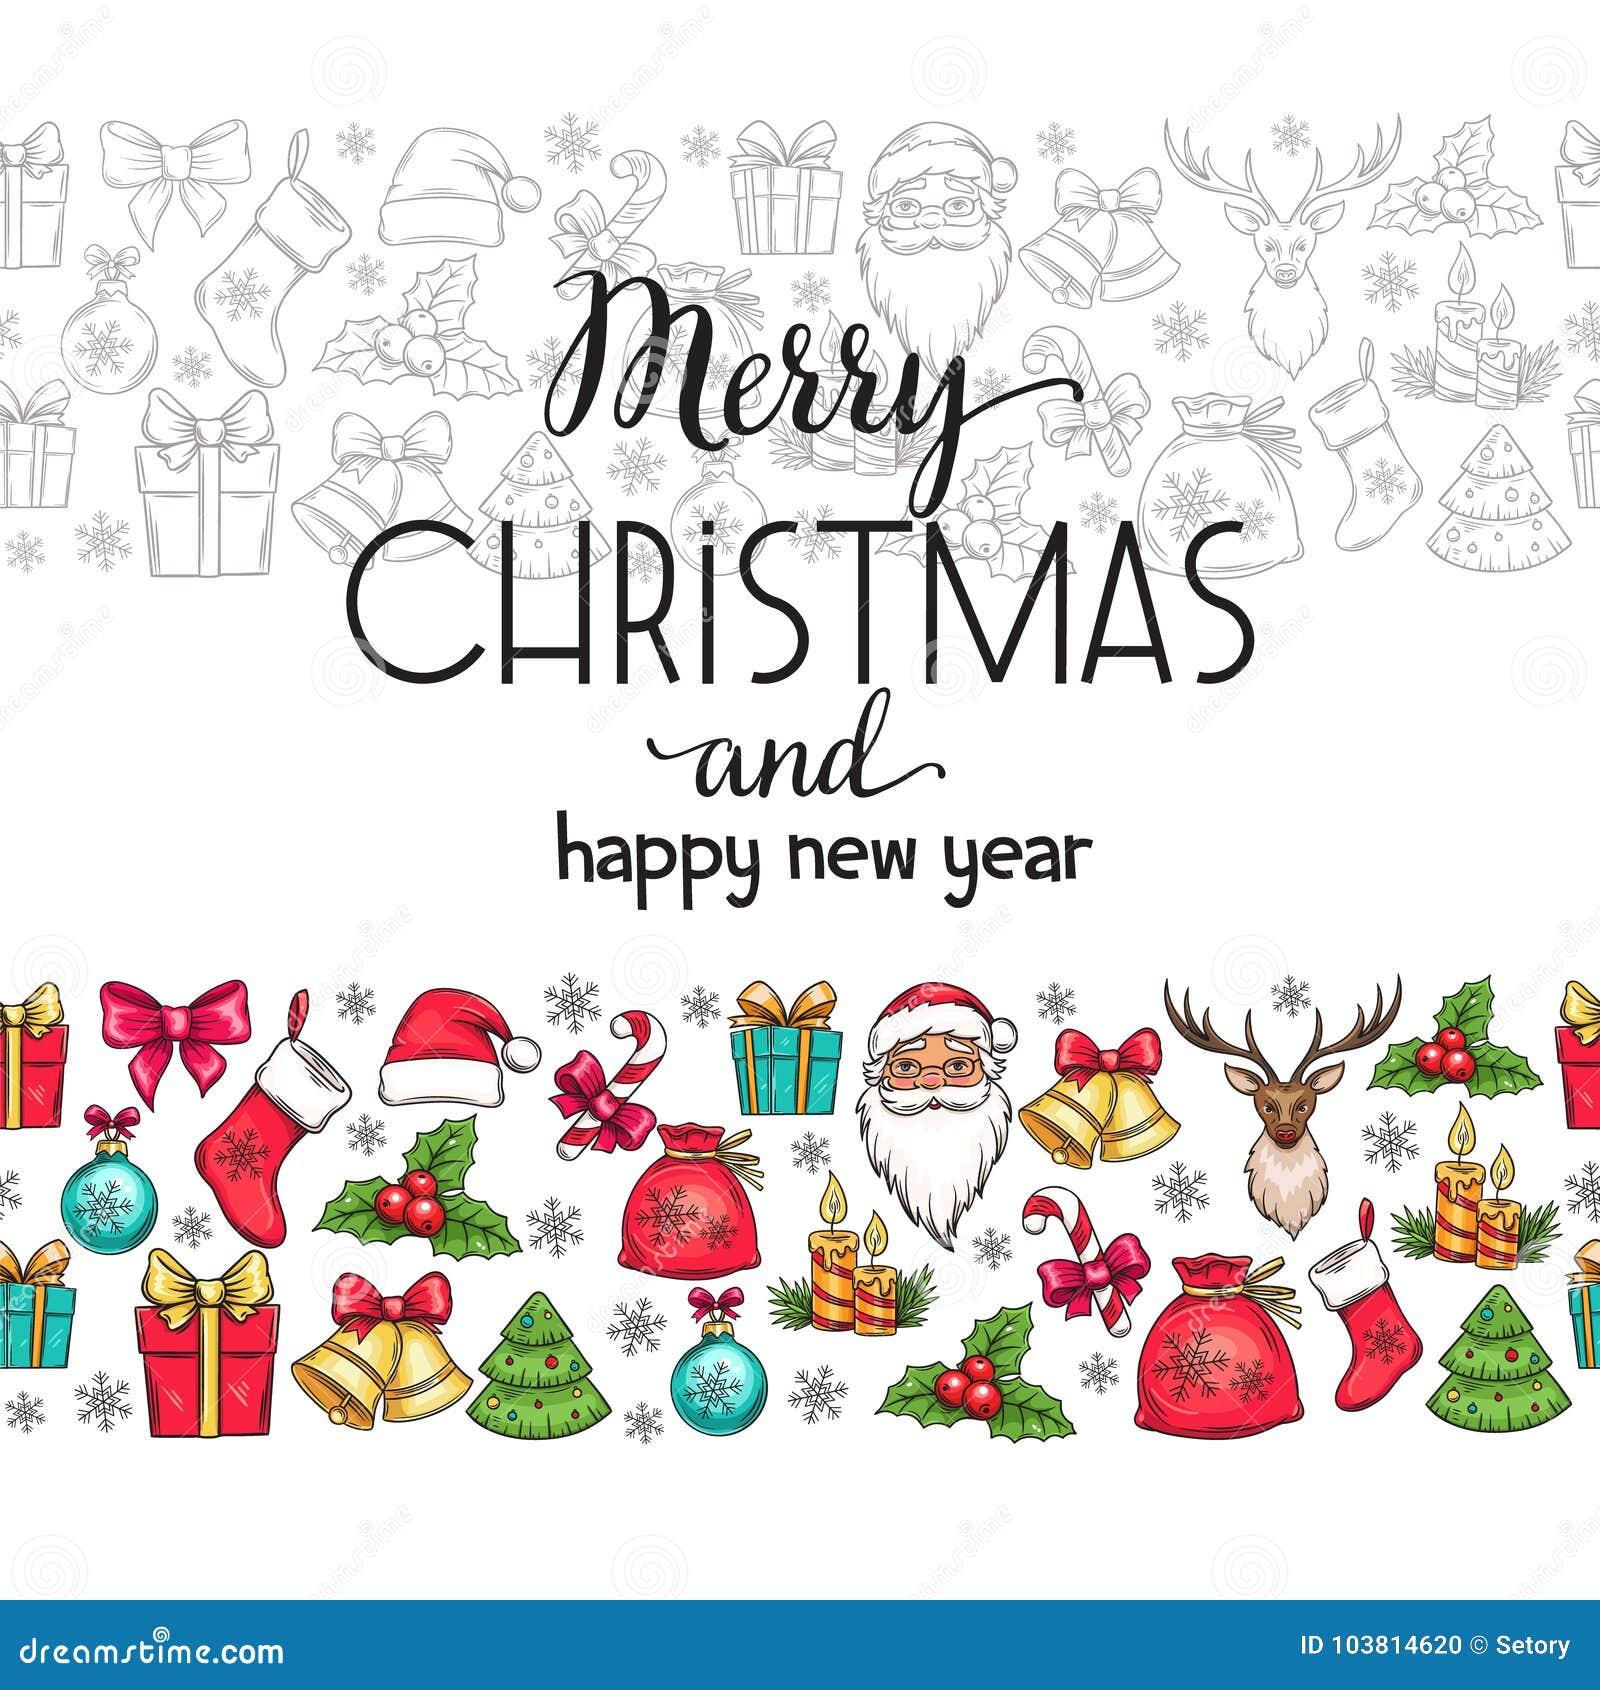 Merry Christmas holidays seamless border with